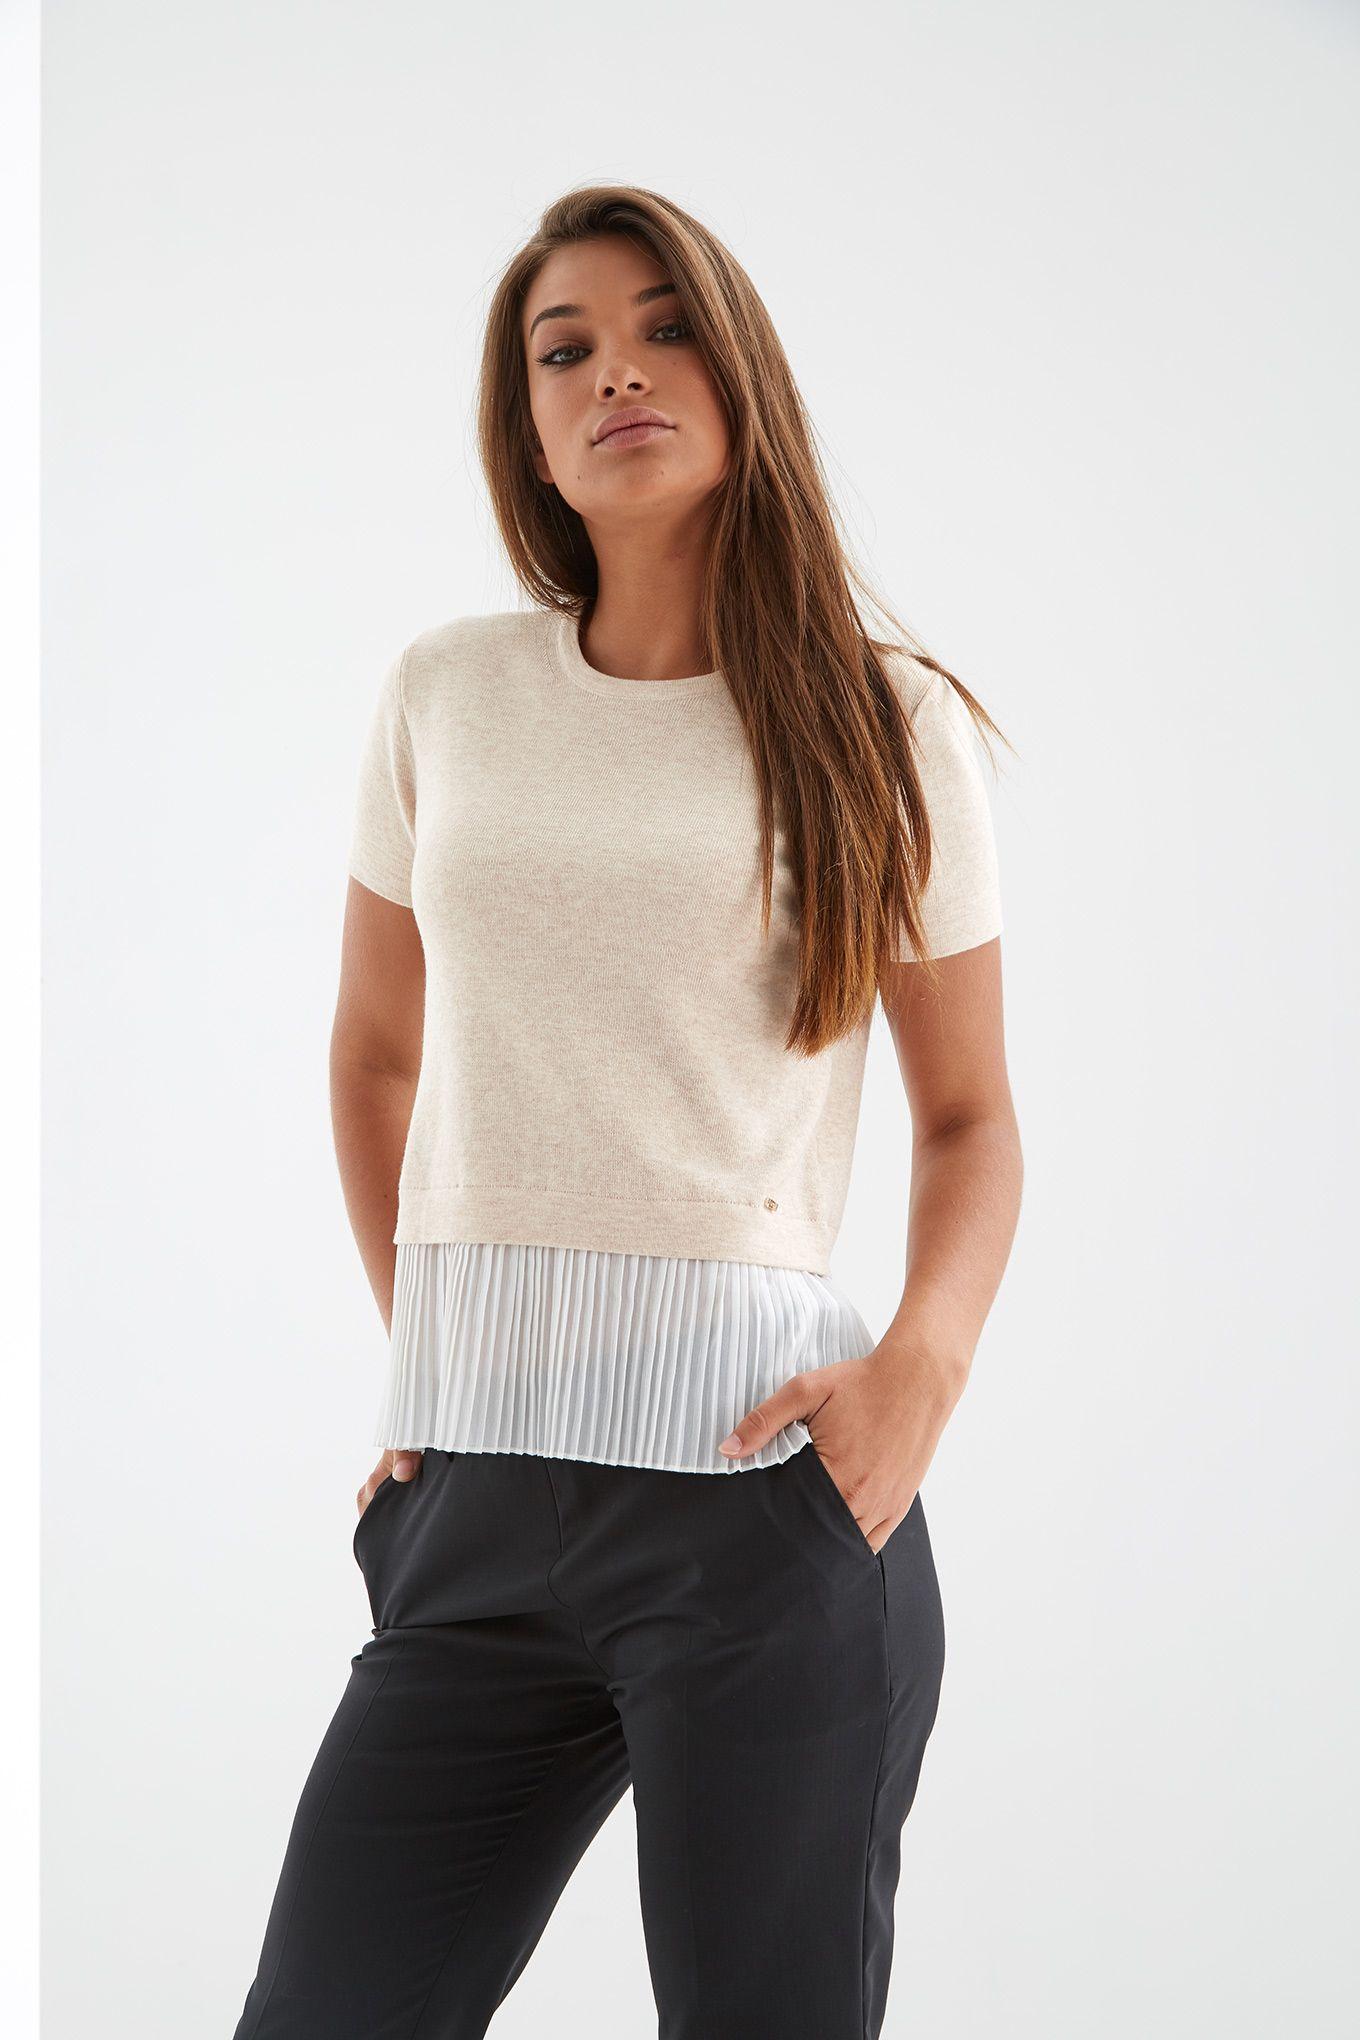 Womens beige short sleeve top